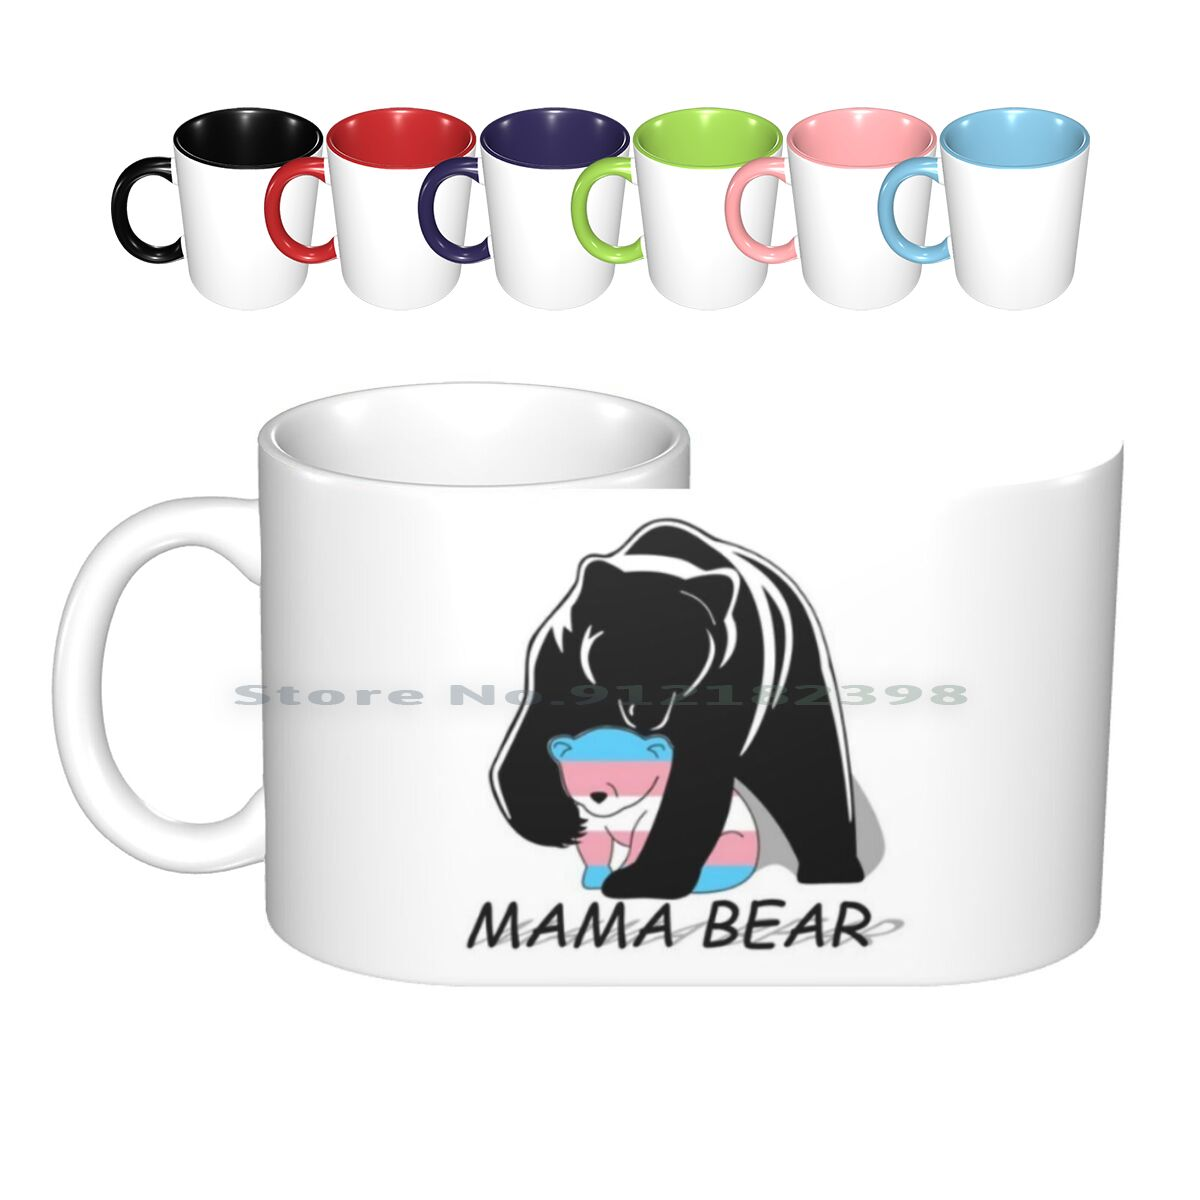 Pride Mama Bear Ceramic Mugs Coffee Cups Milk Tea Mug Pride Mama Bear Lgbt Pride Creative Trending Vintage Gift Bottle Cup